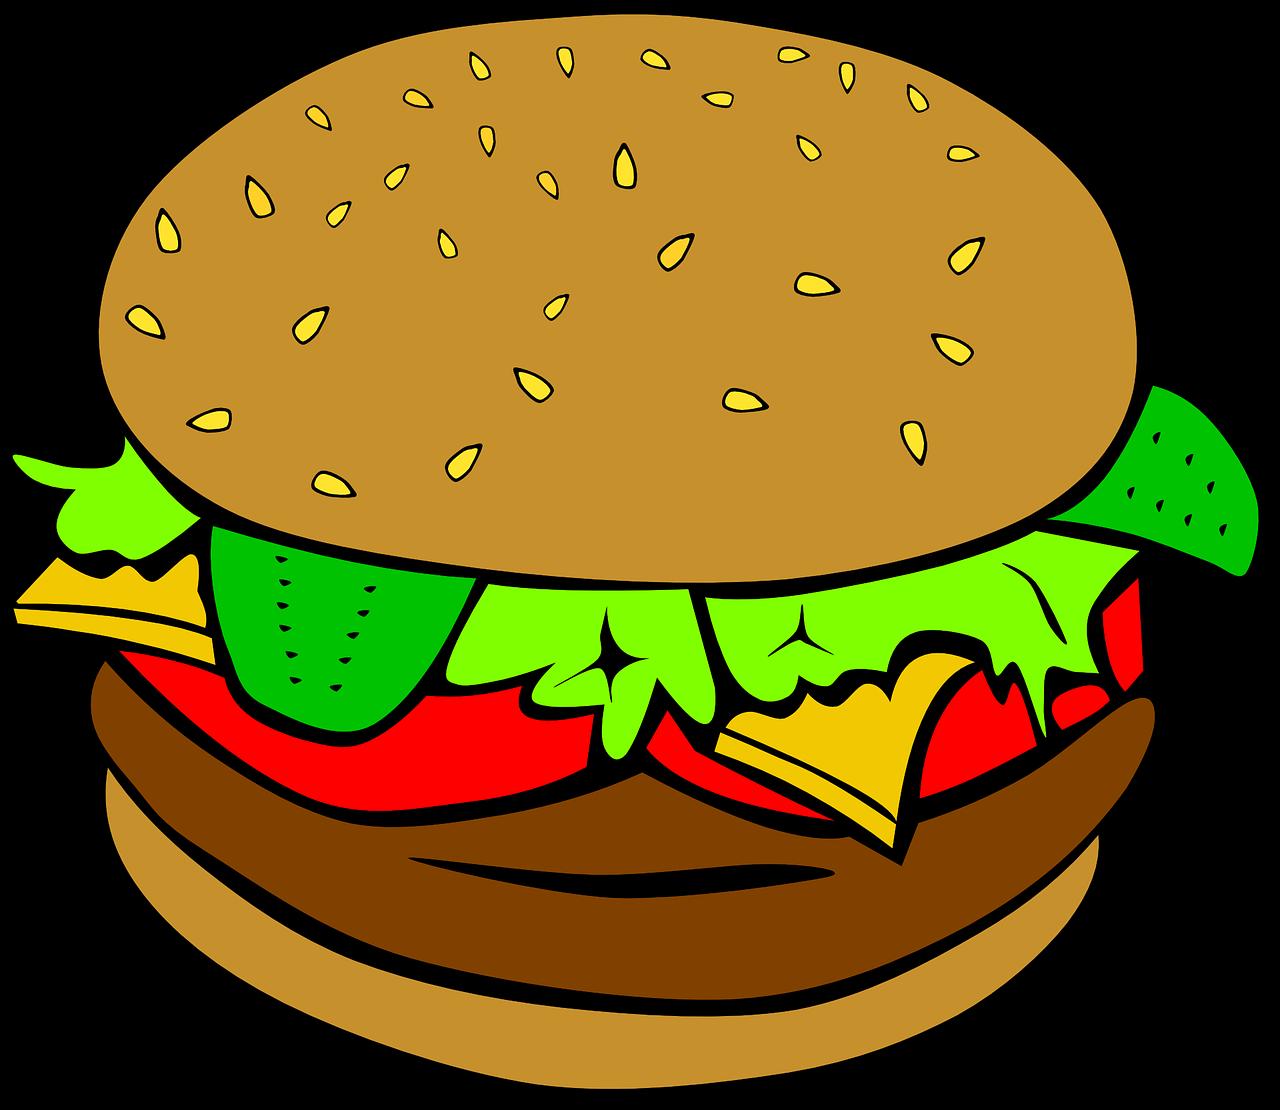 Breaking news sports troy. Clipart restaurant burger restaurant